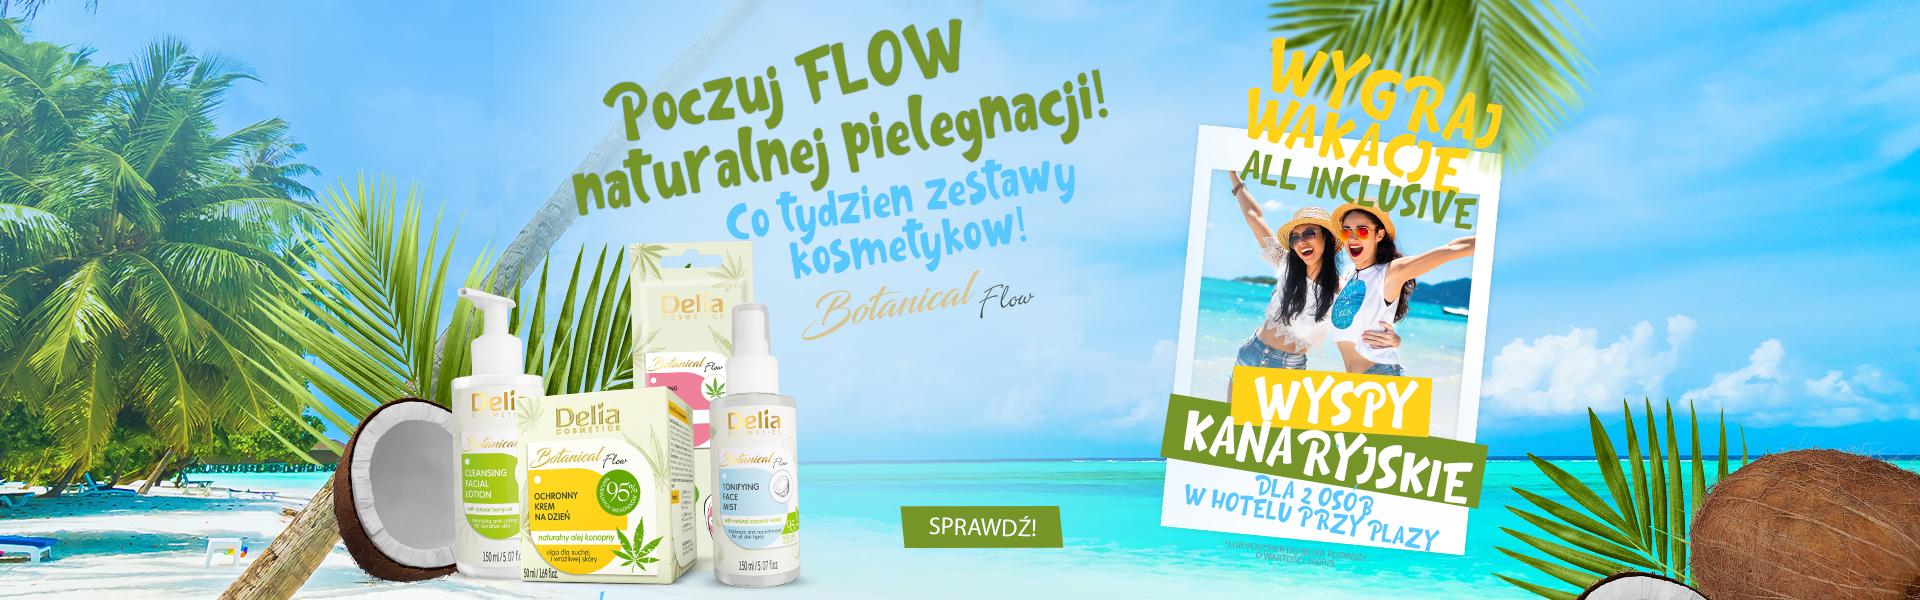 2019-06-07_slider_konkurs_strona